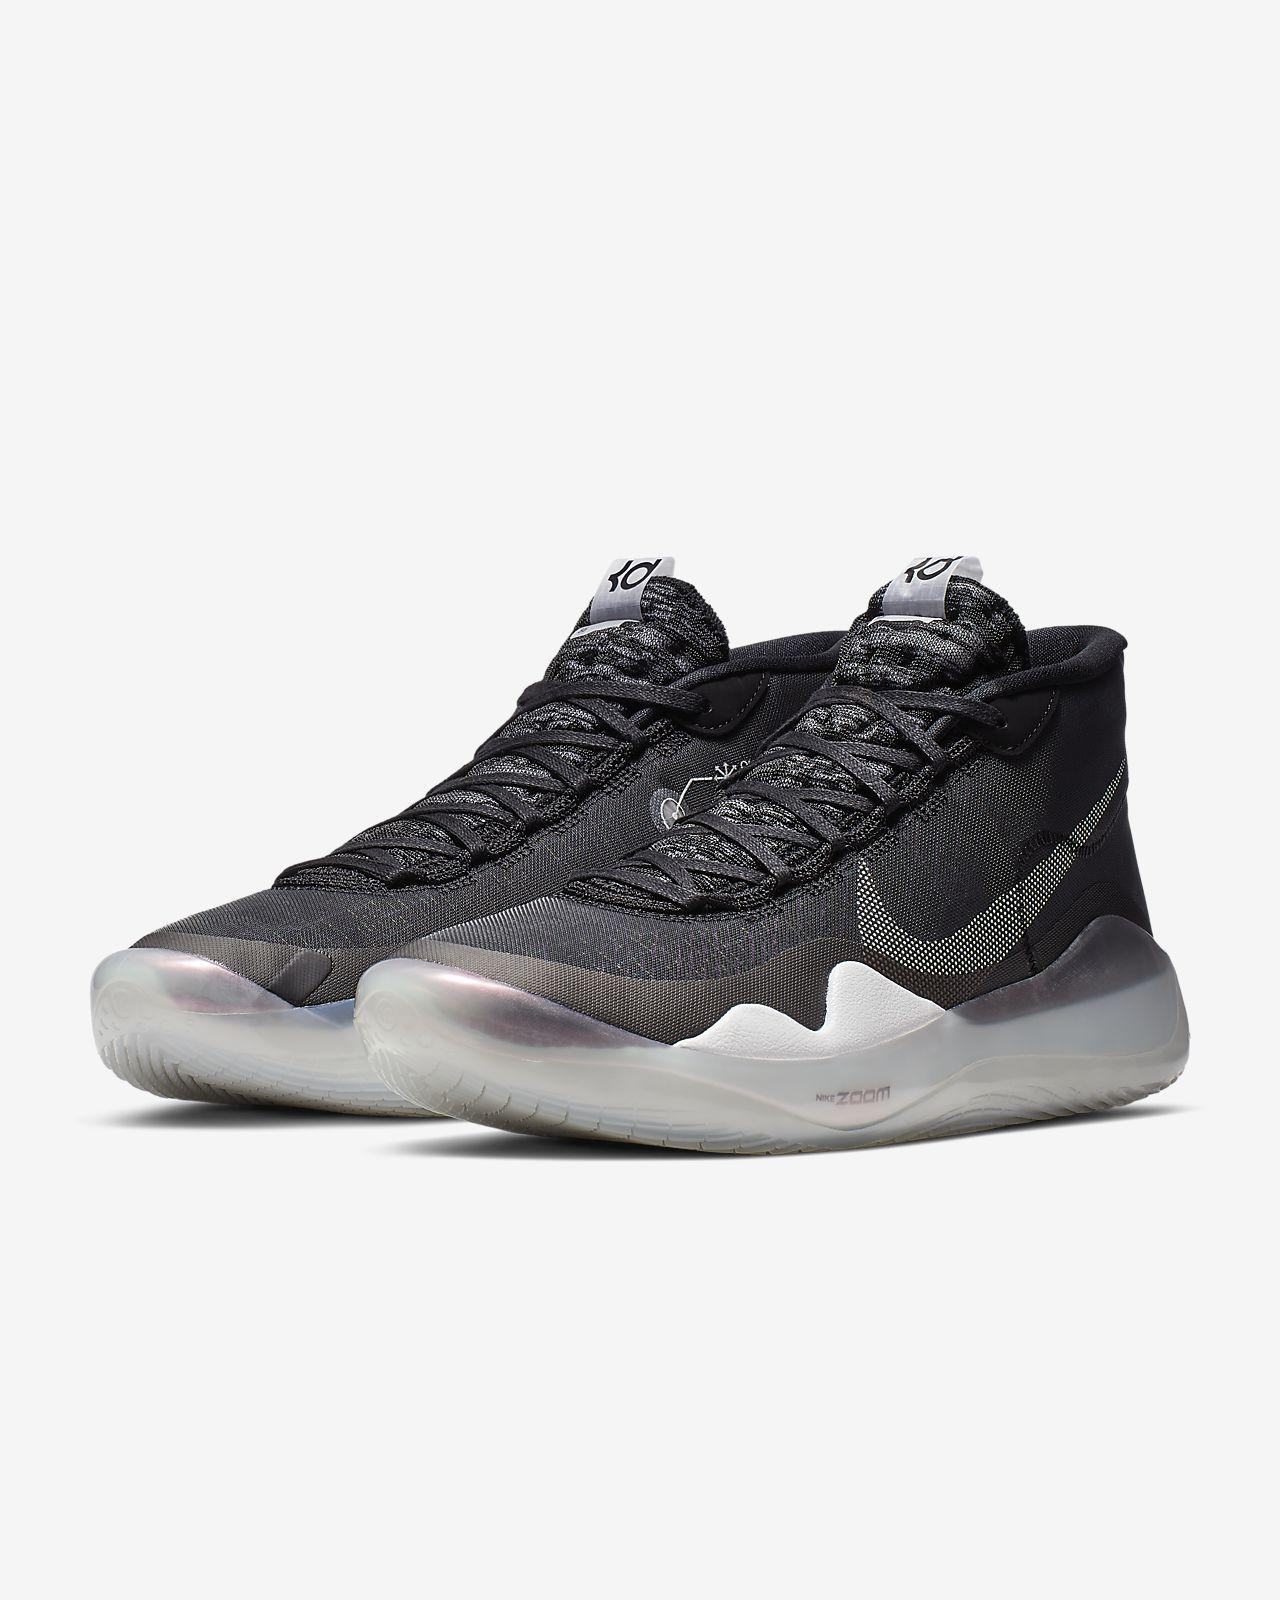 newest 422be d06b5 ... Chaussure de basketball Nike Zoom KD12